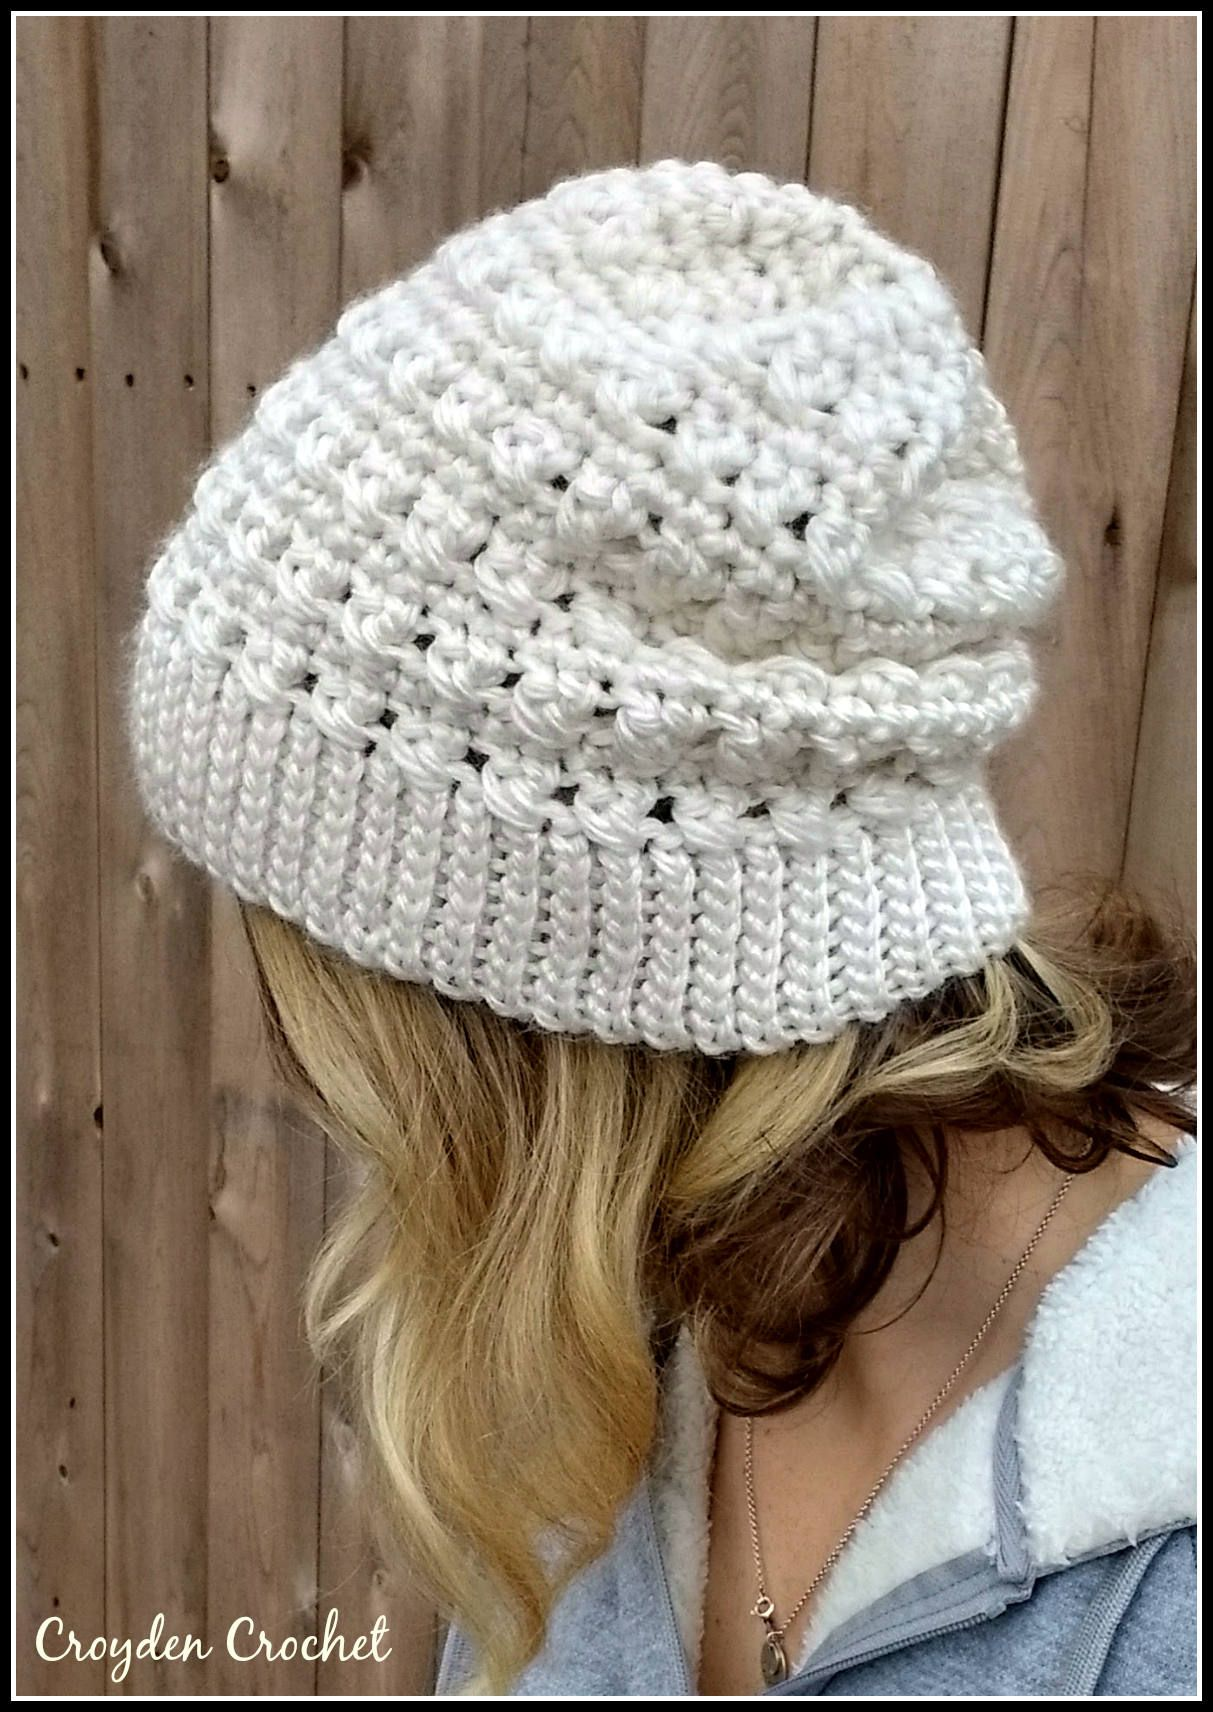 Every Girl Slouch Beanie CROCHET PATTERN ONLY | Crochet - Hats ...